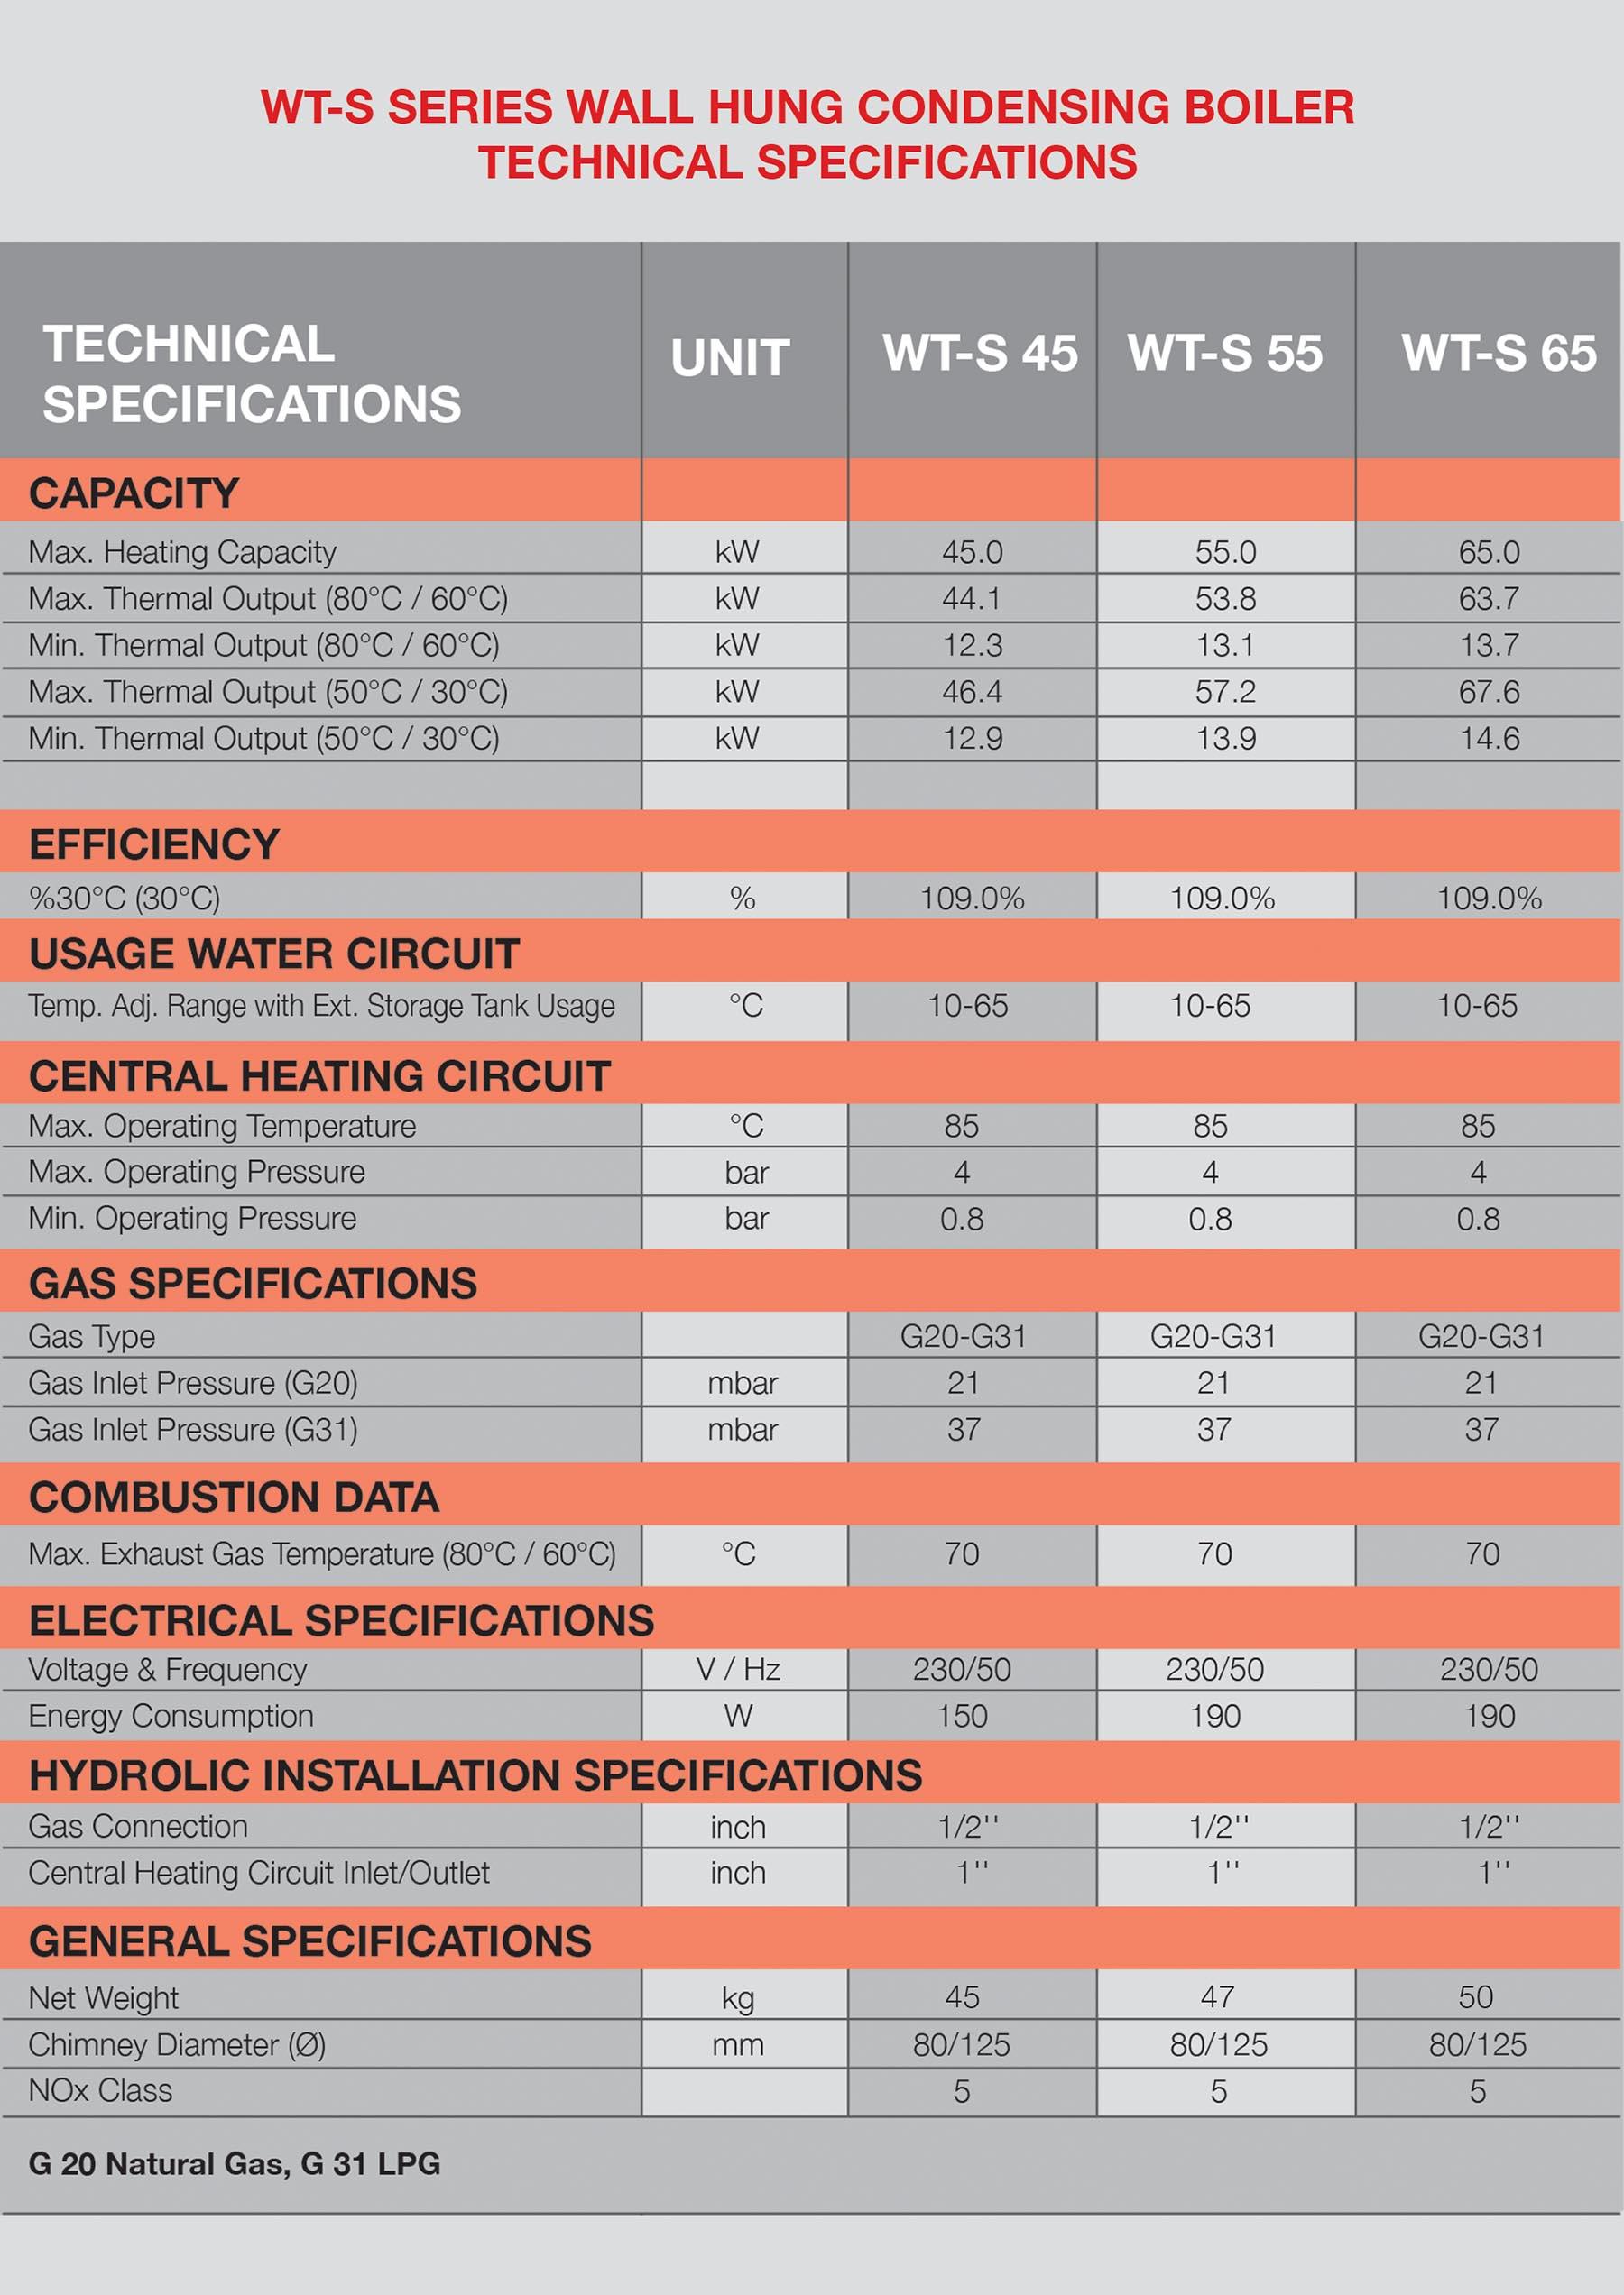 commercial condensing gas boilers, condensing gas boiler, modular gas boilers, stainless steel heat exchanger gas boiler